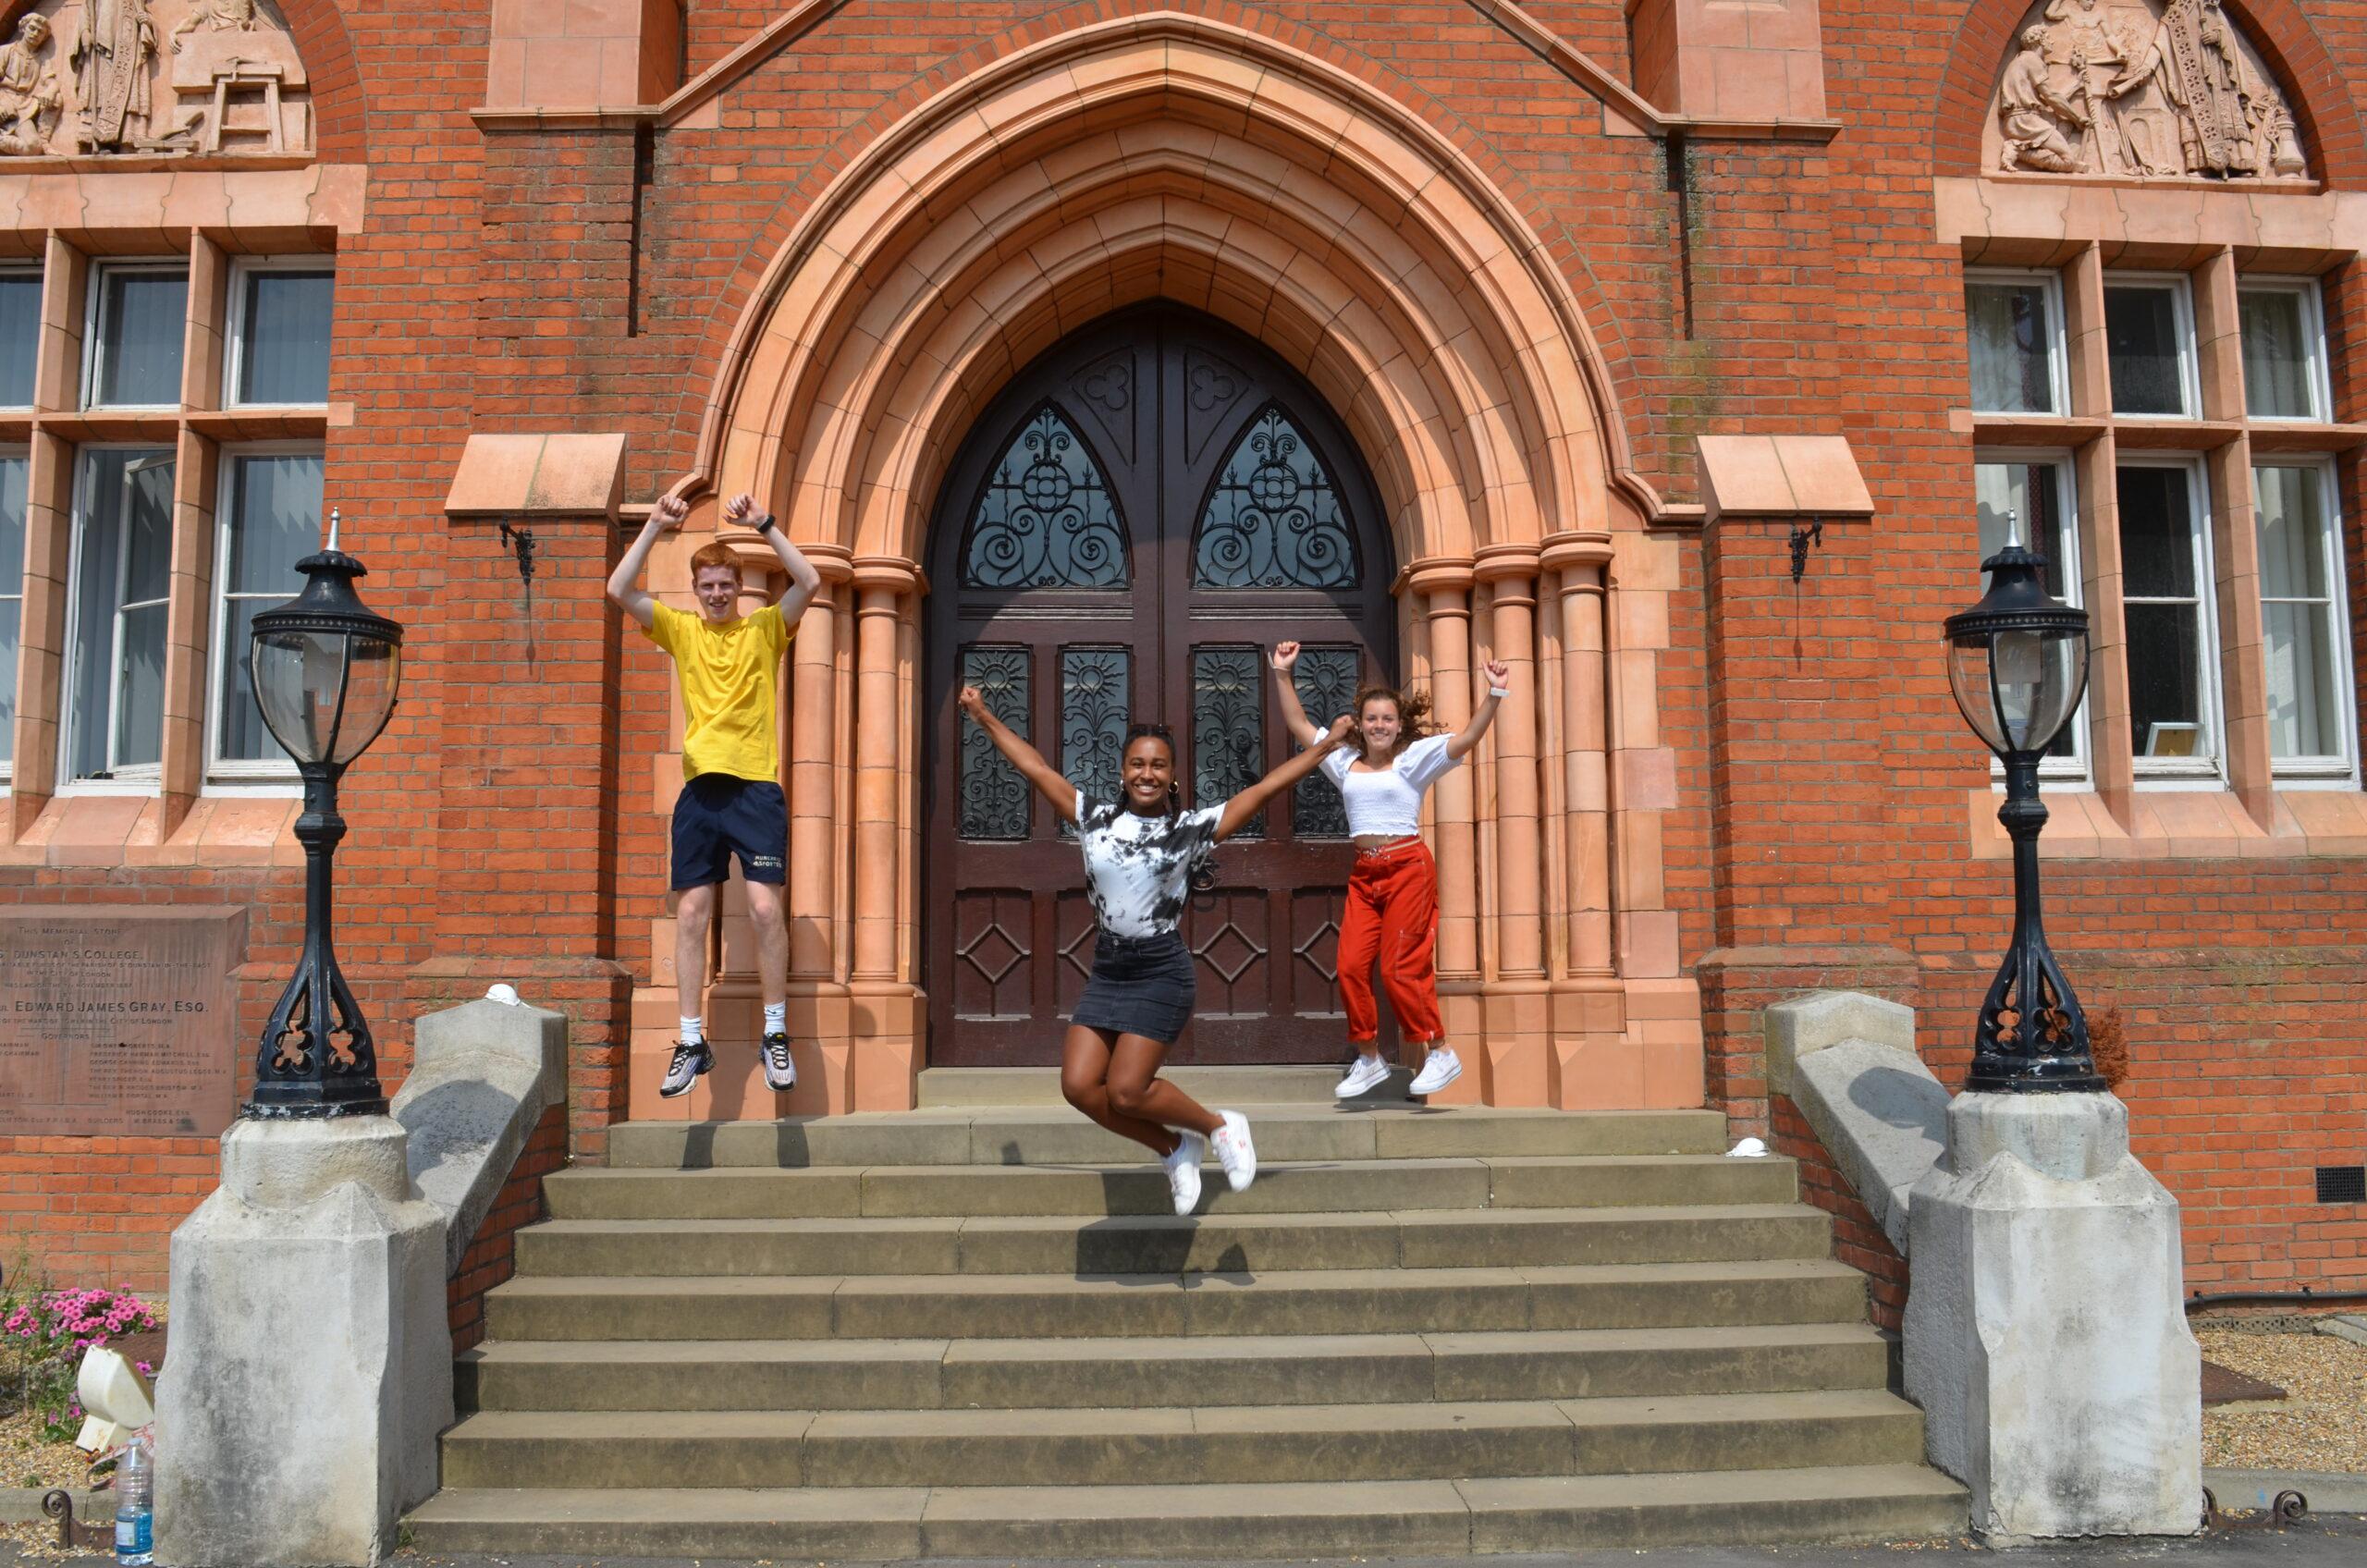 St Dunstan's College celebrates A level results